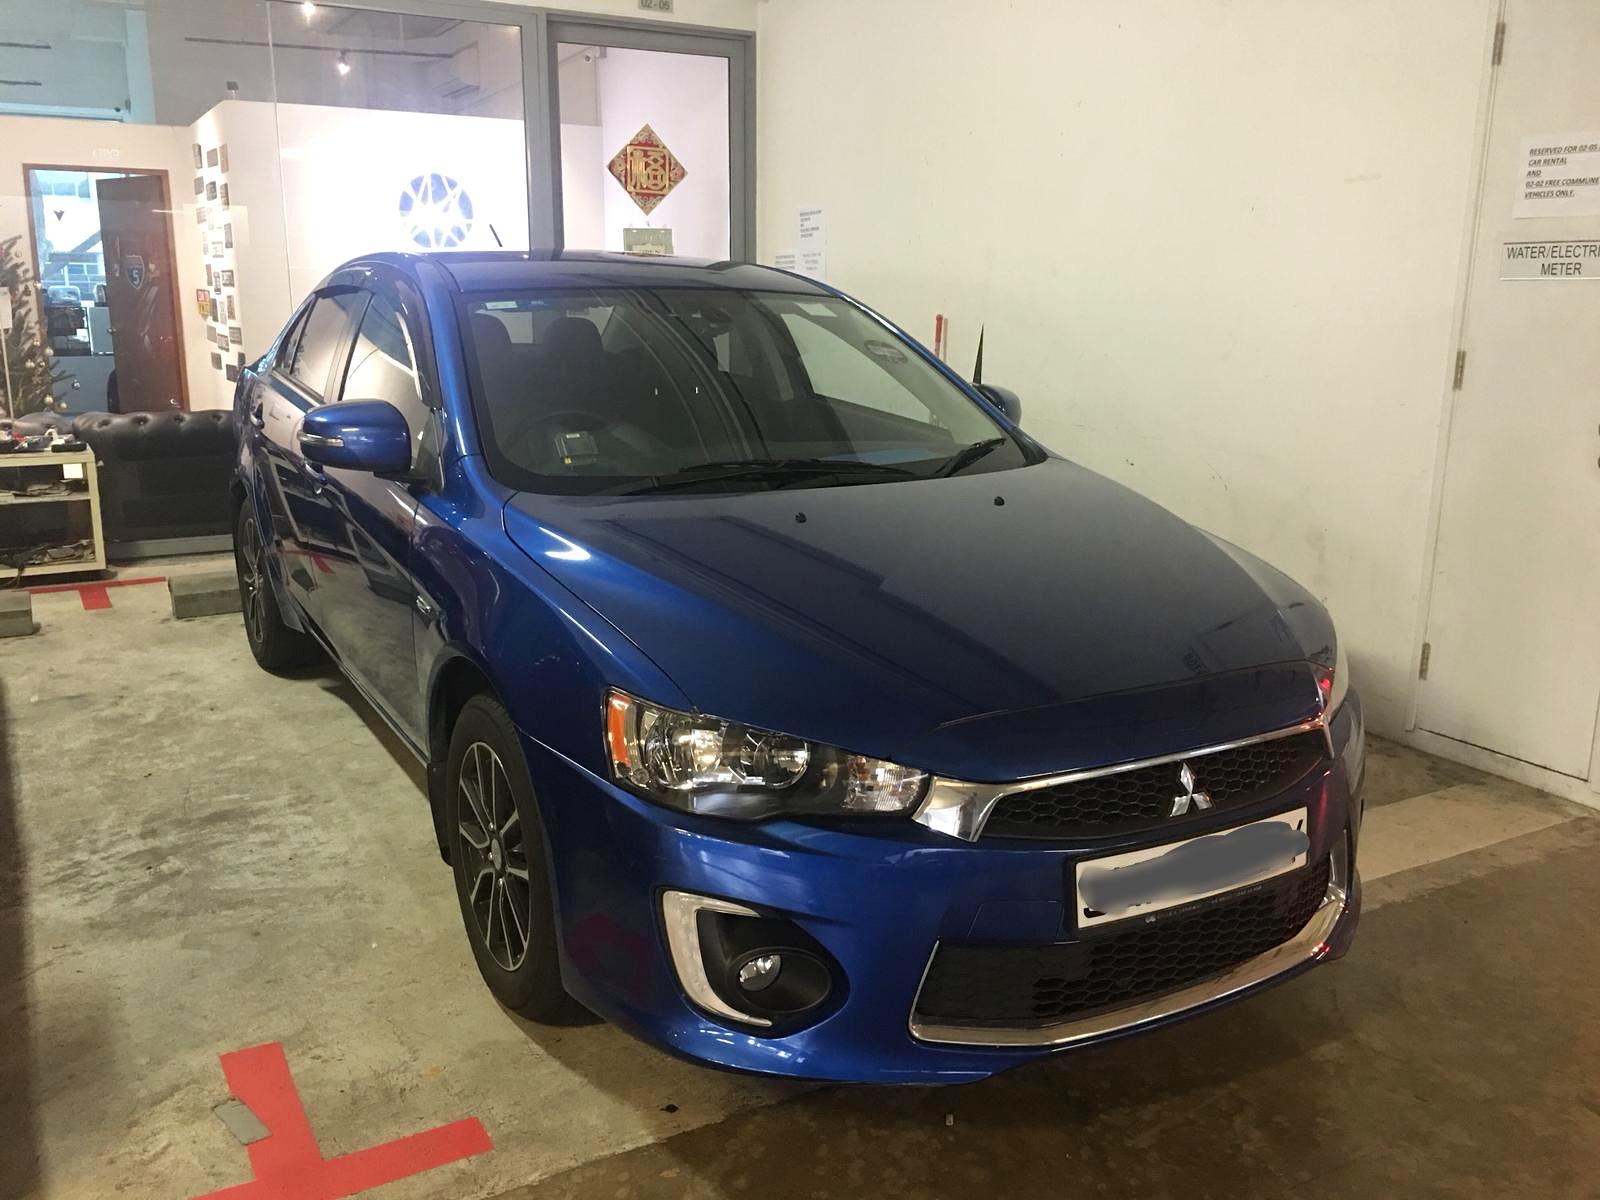 https://akacarrentalsg.com.sg/wp-content/uploads/2019/03/Mitsubishi-Lancer-EX_SMF4797Y.jpg